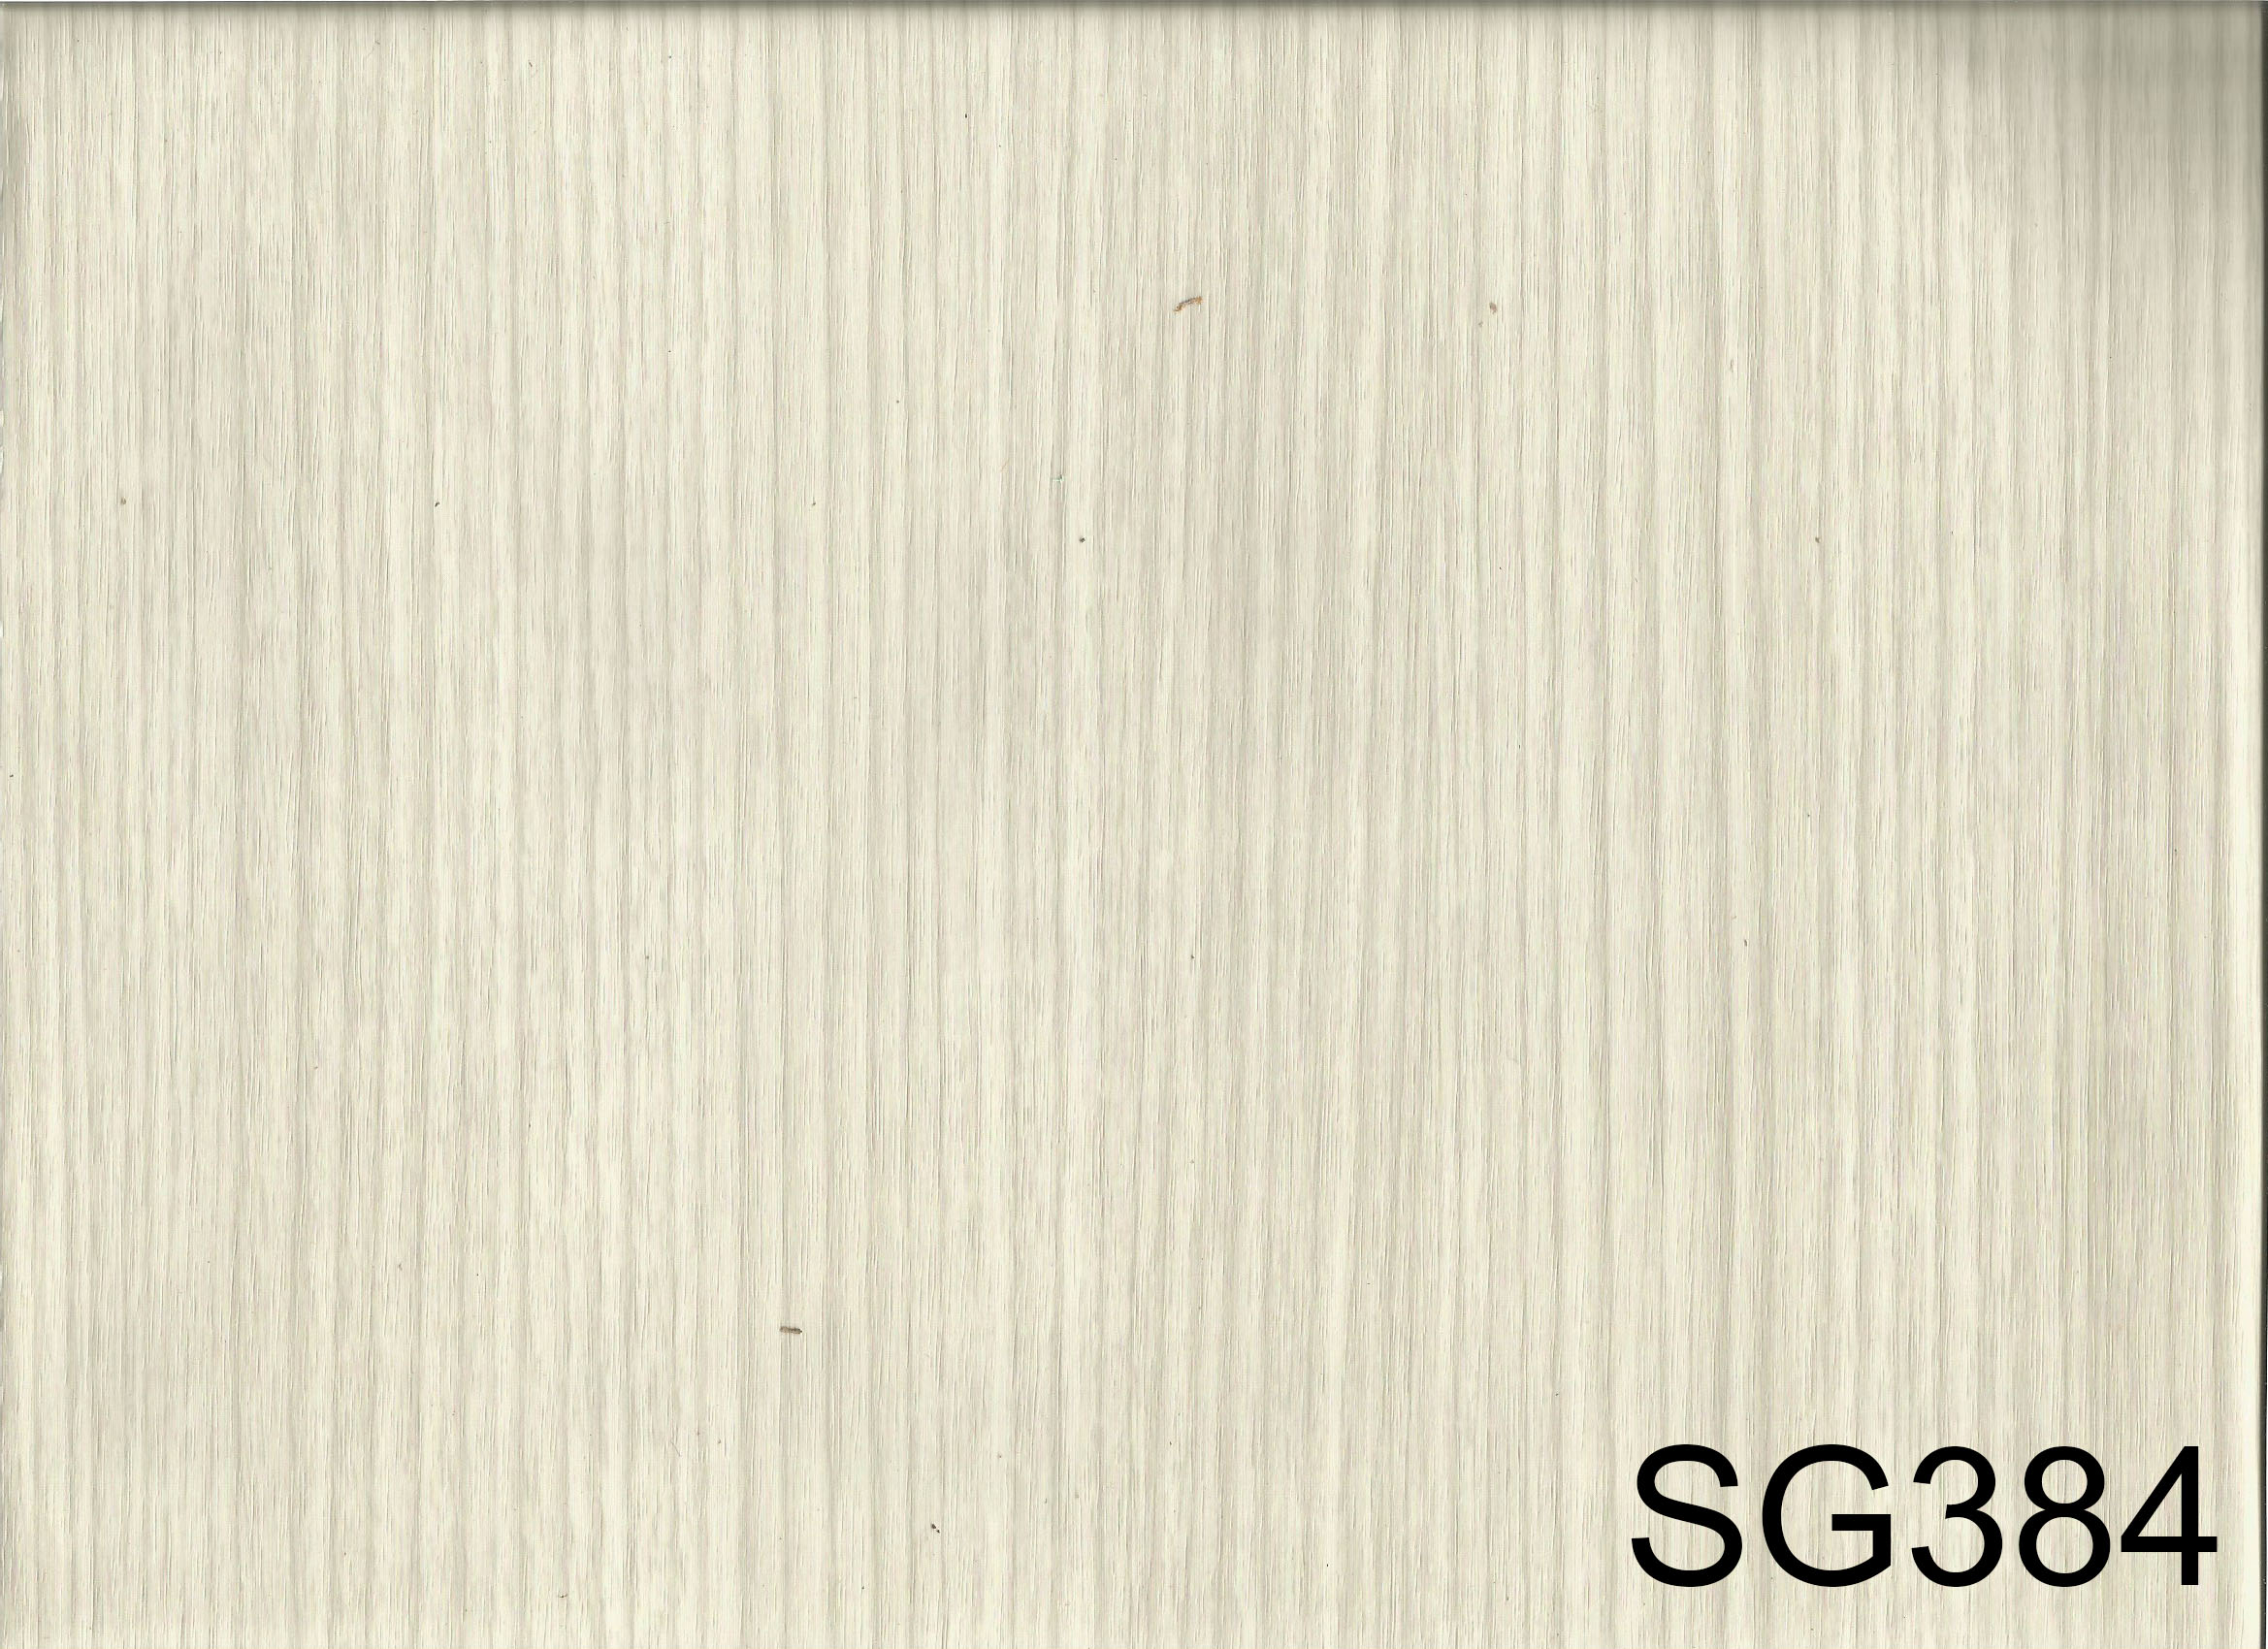 SG384